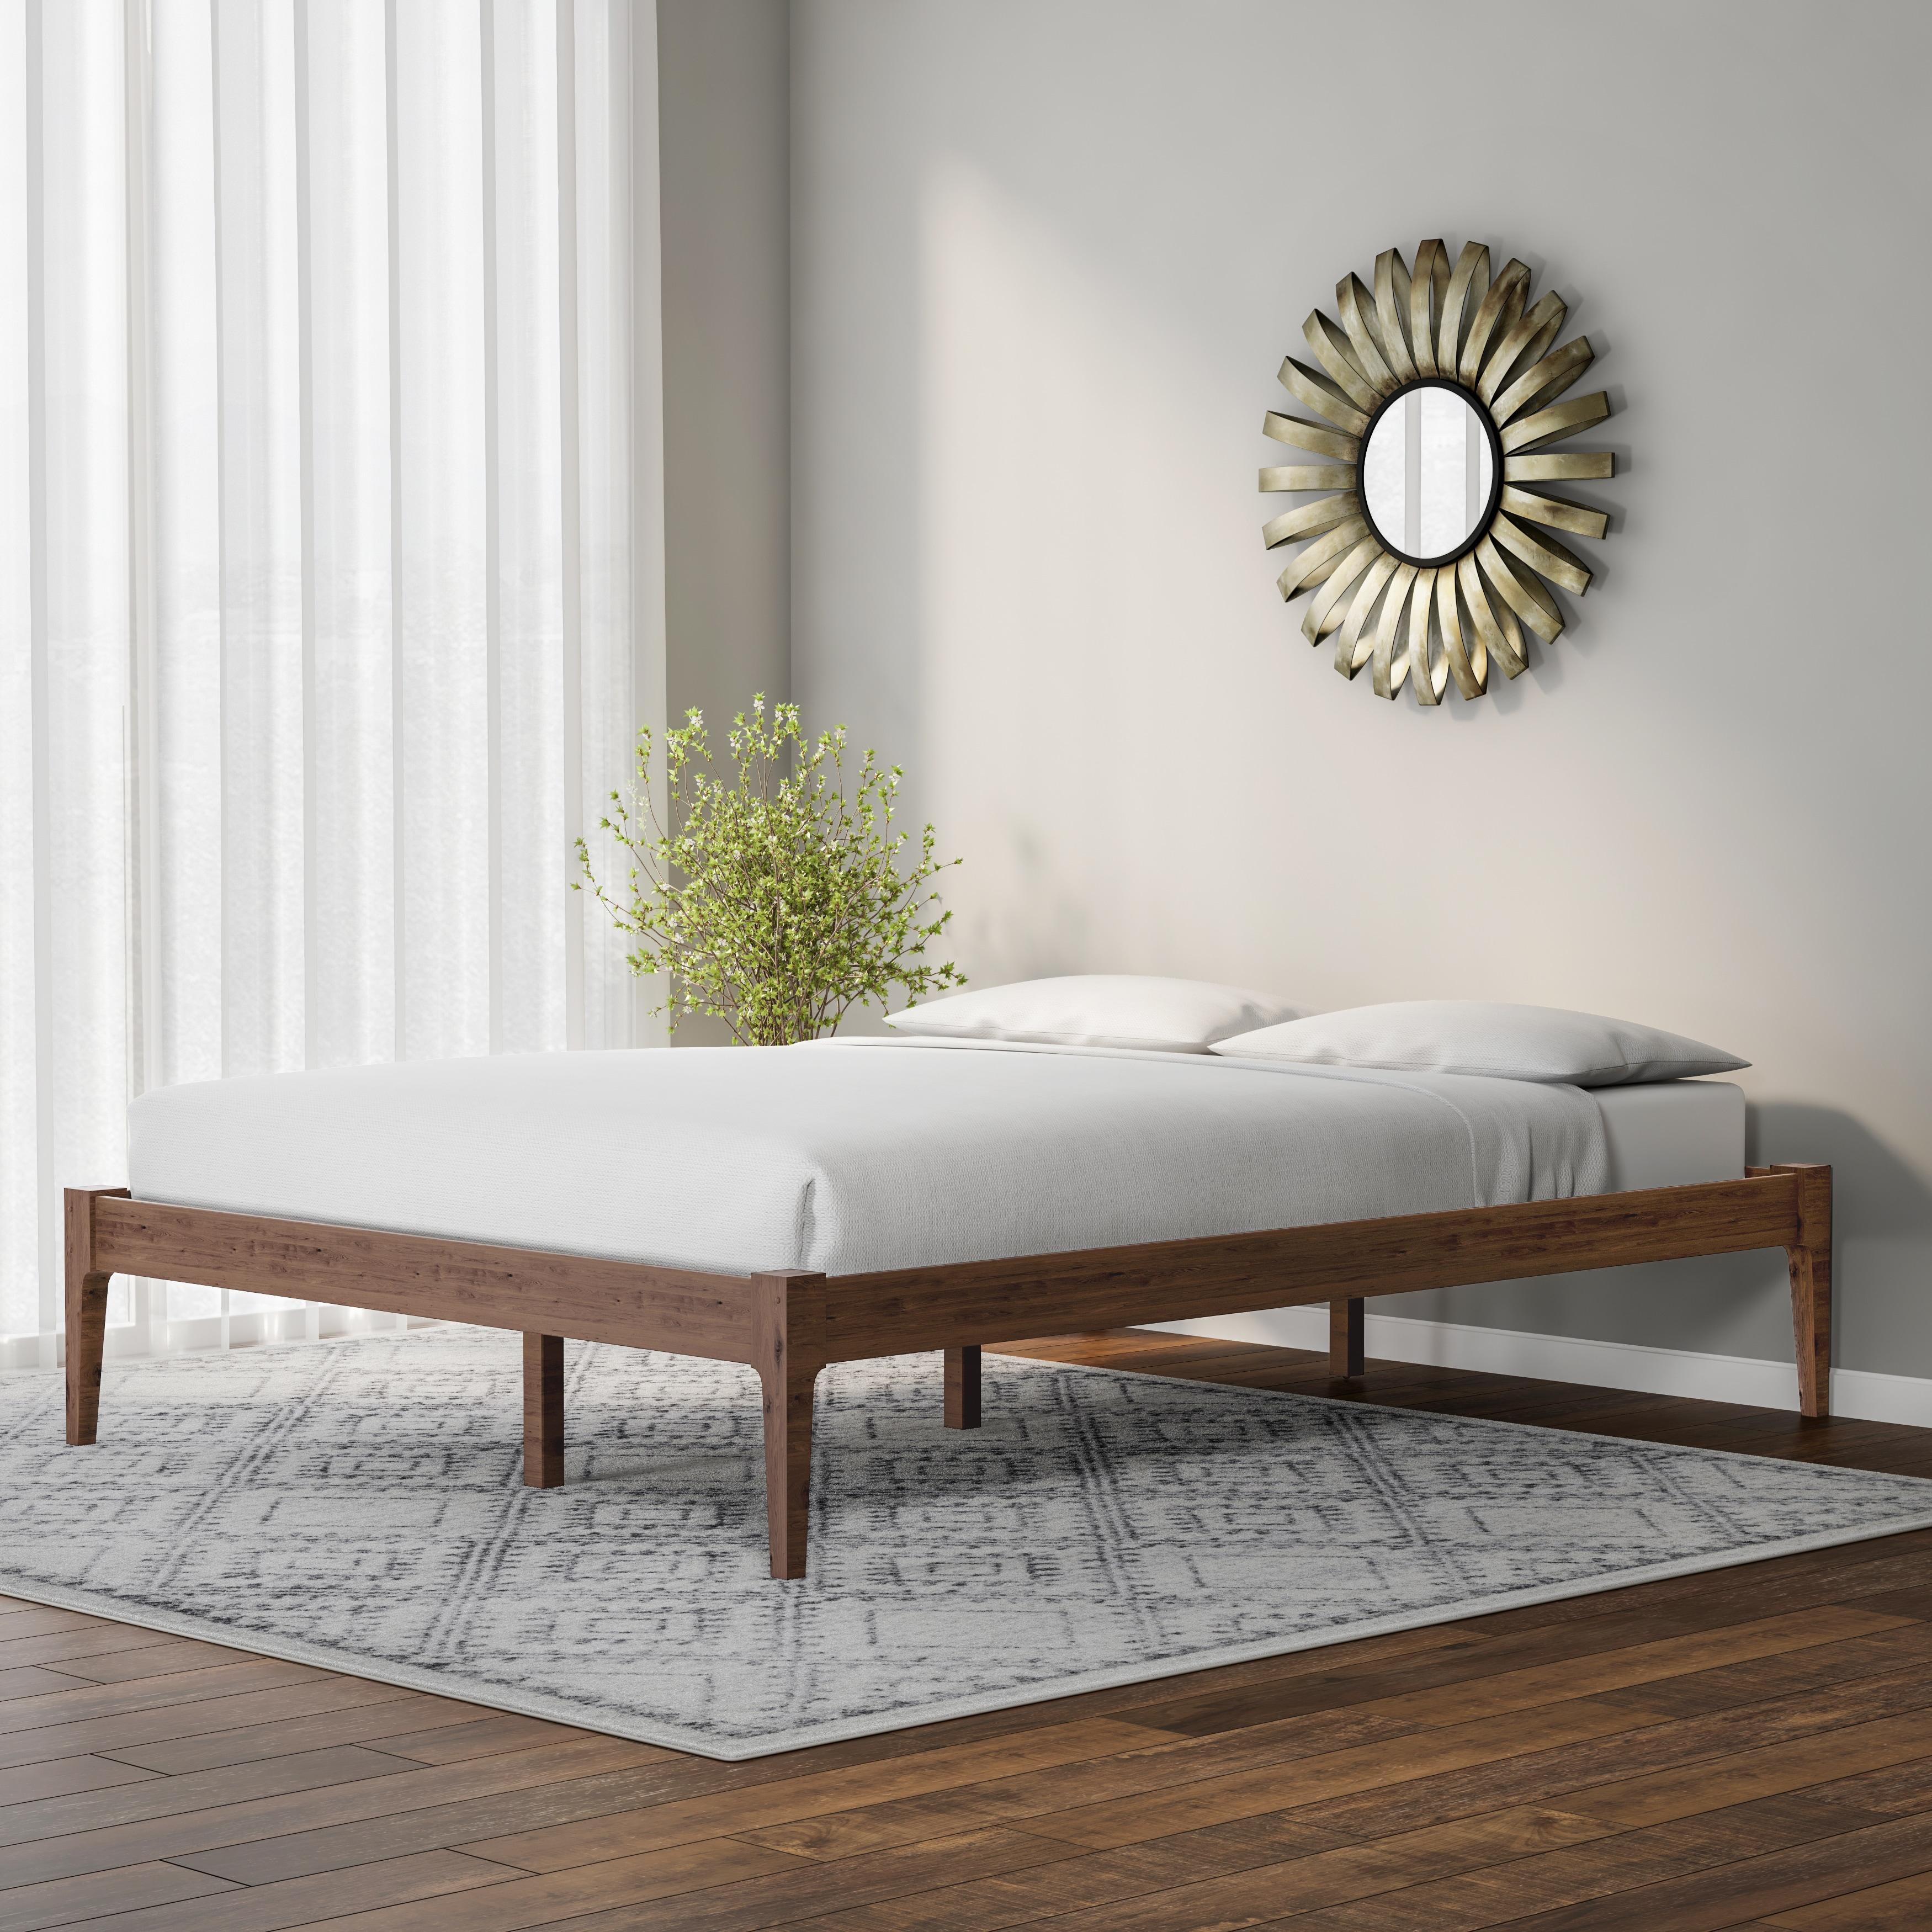 Shop Baxton Studio Mid Century Modern Solid Wood Platform Bed Free